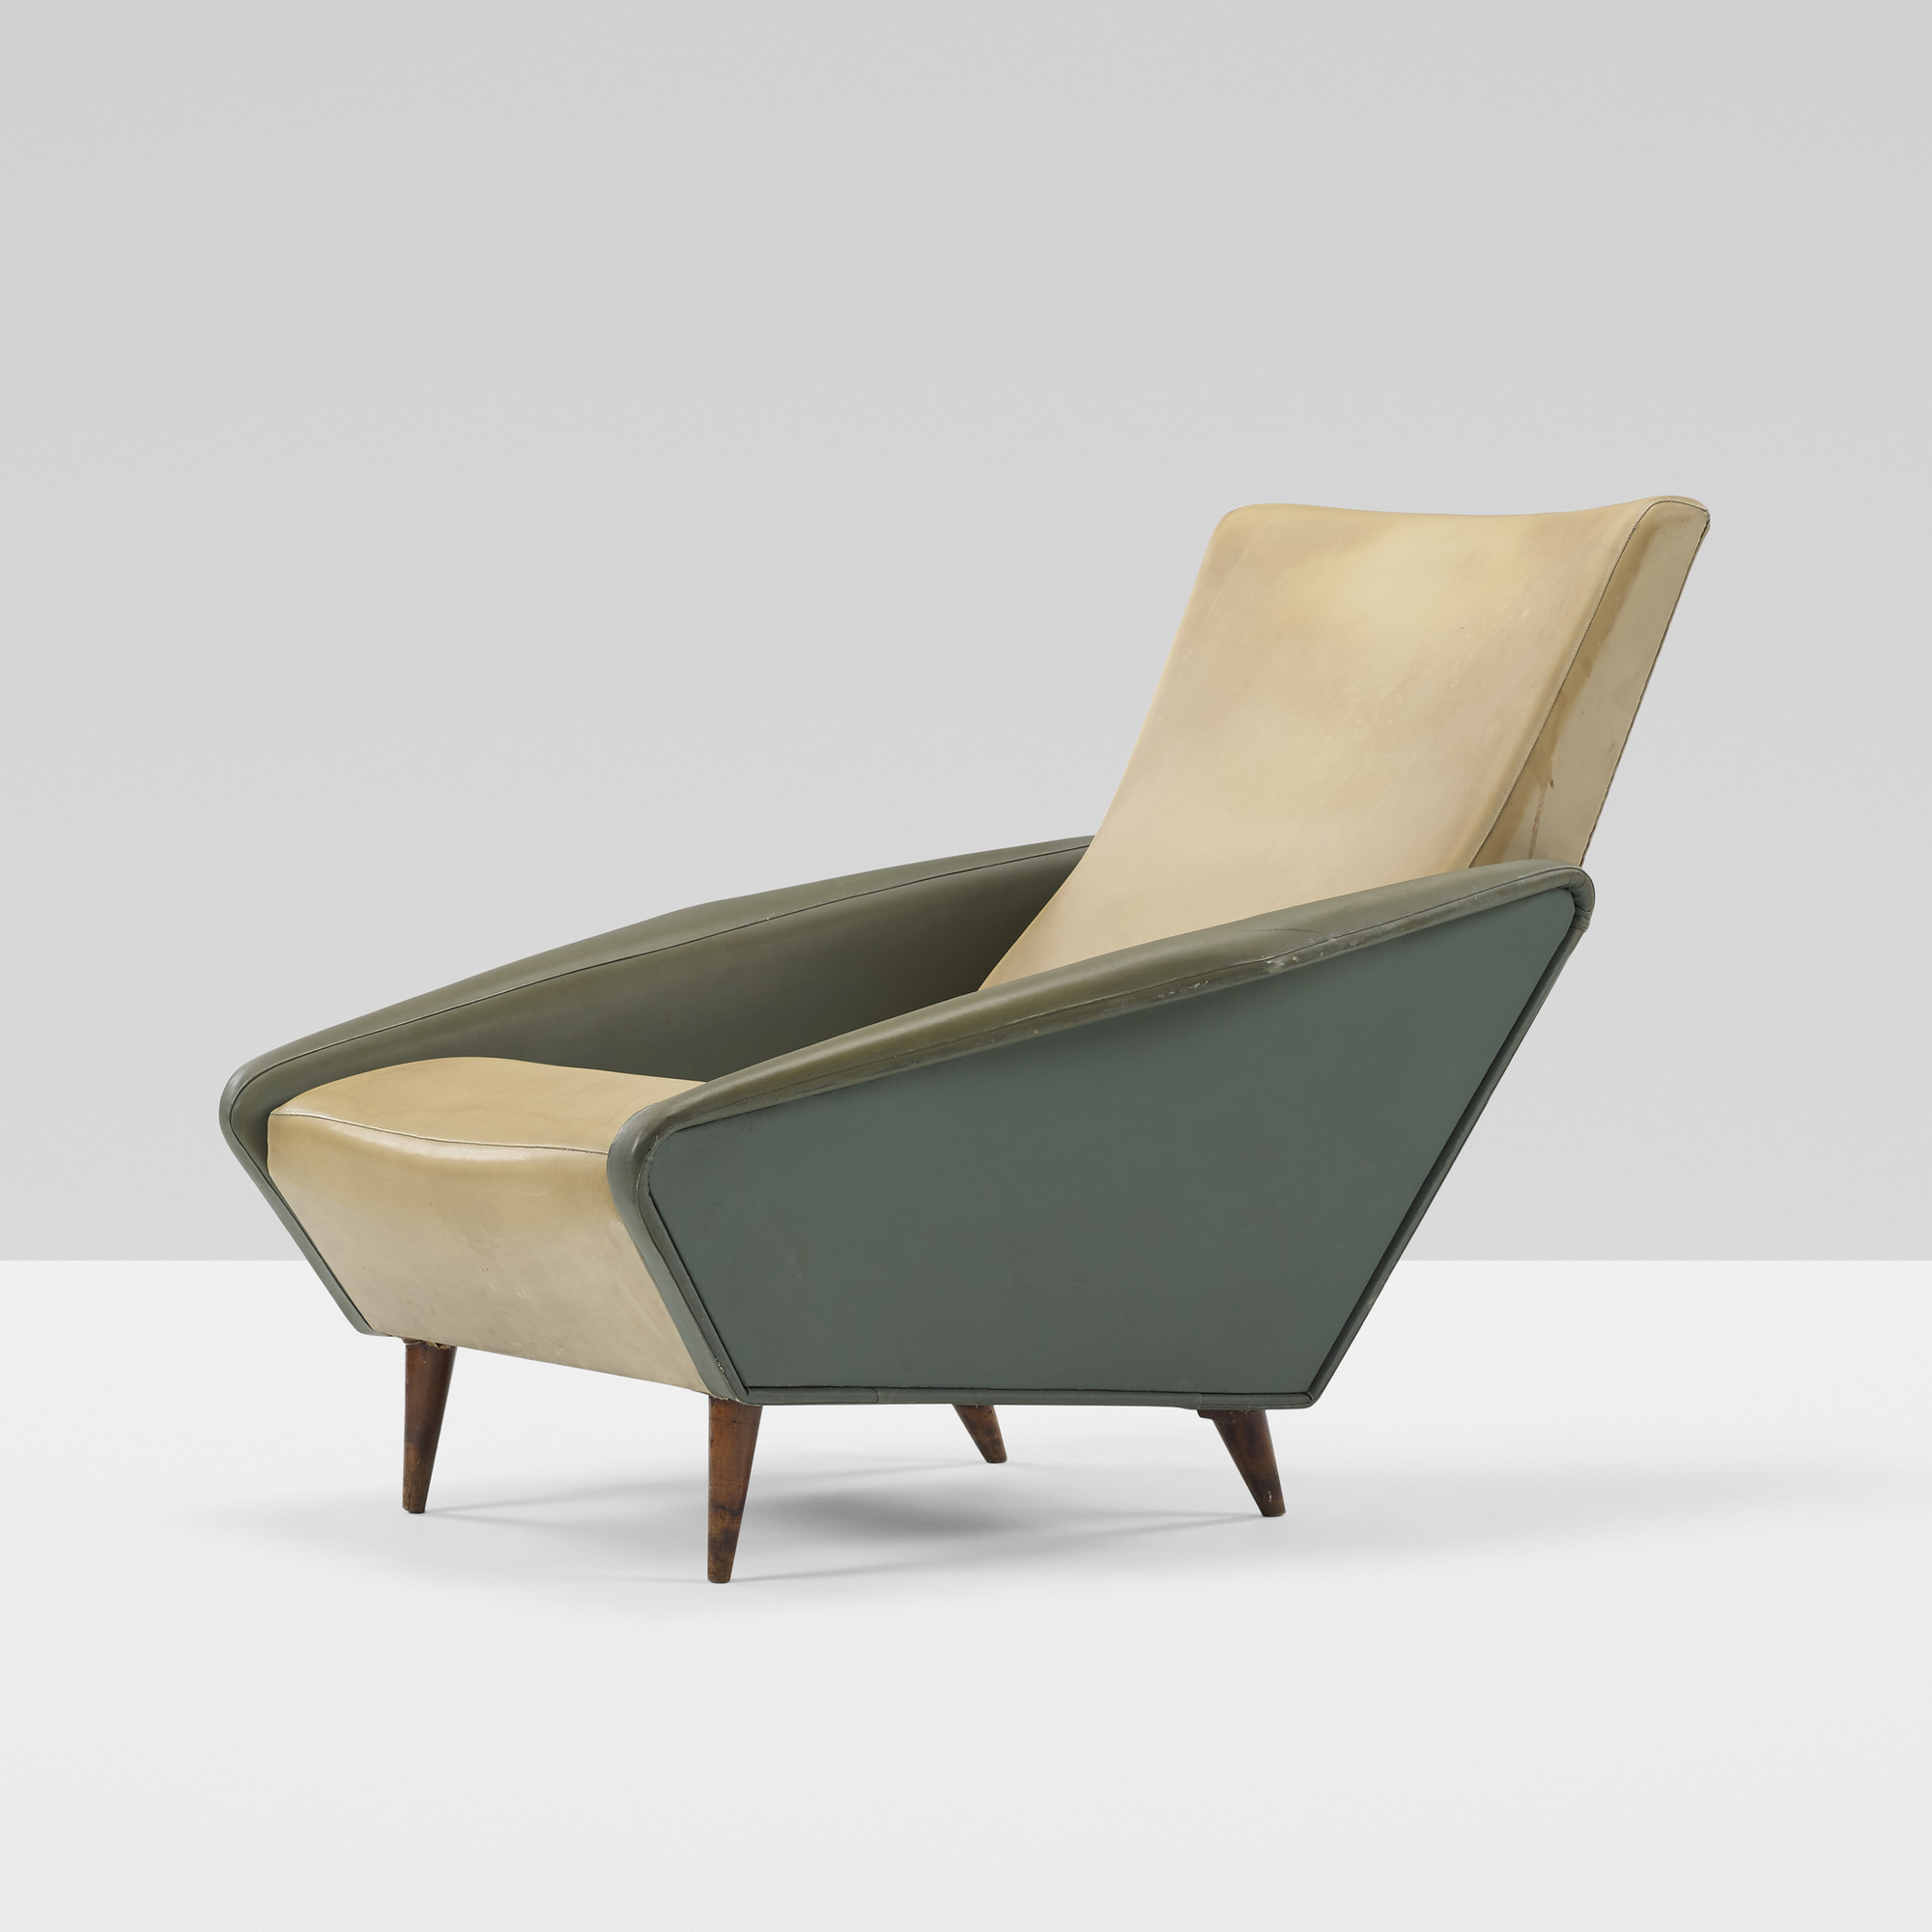 Etonnant 248: Gio Ponti / Distex Lounge Chair, Model 807 (1 Of 3)